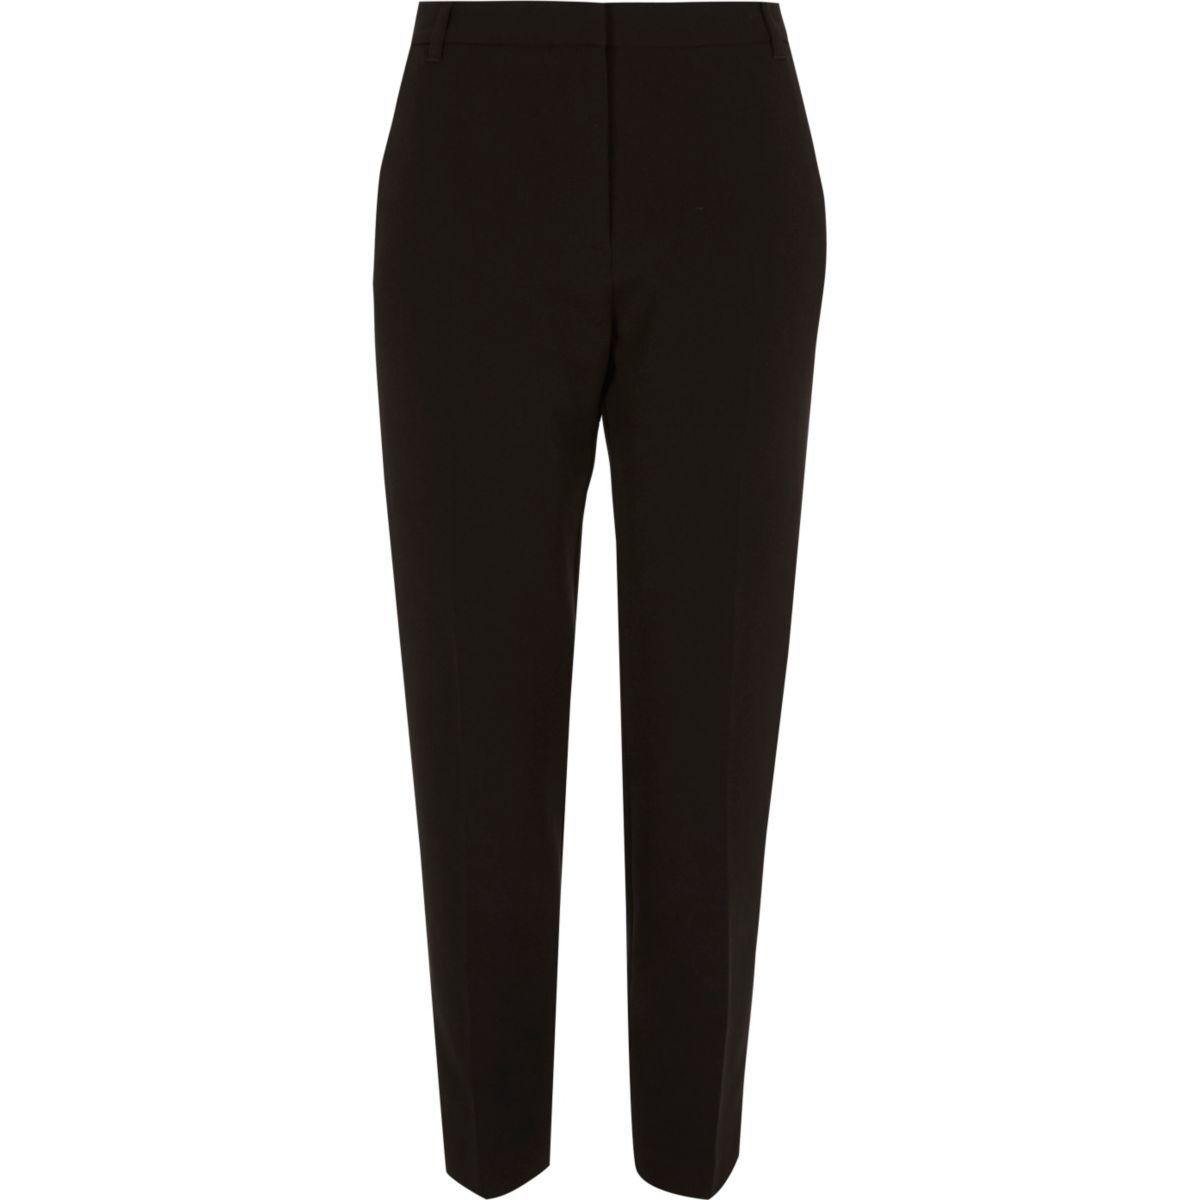 Black tapered smart pants